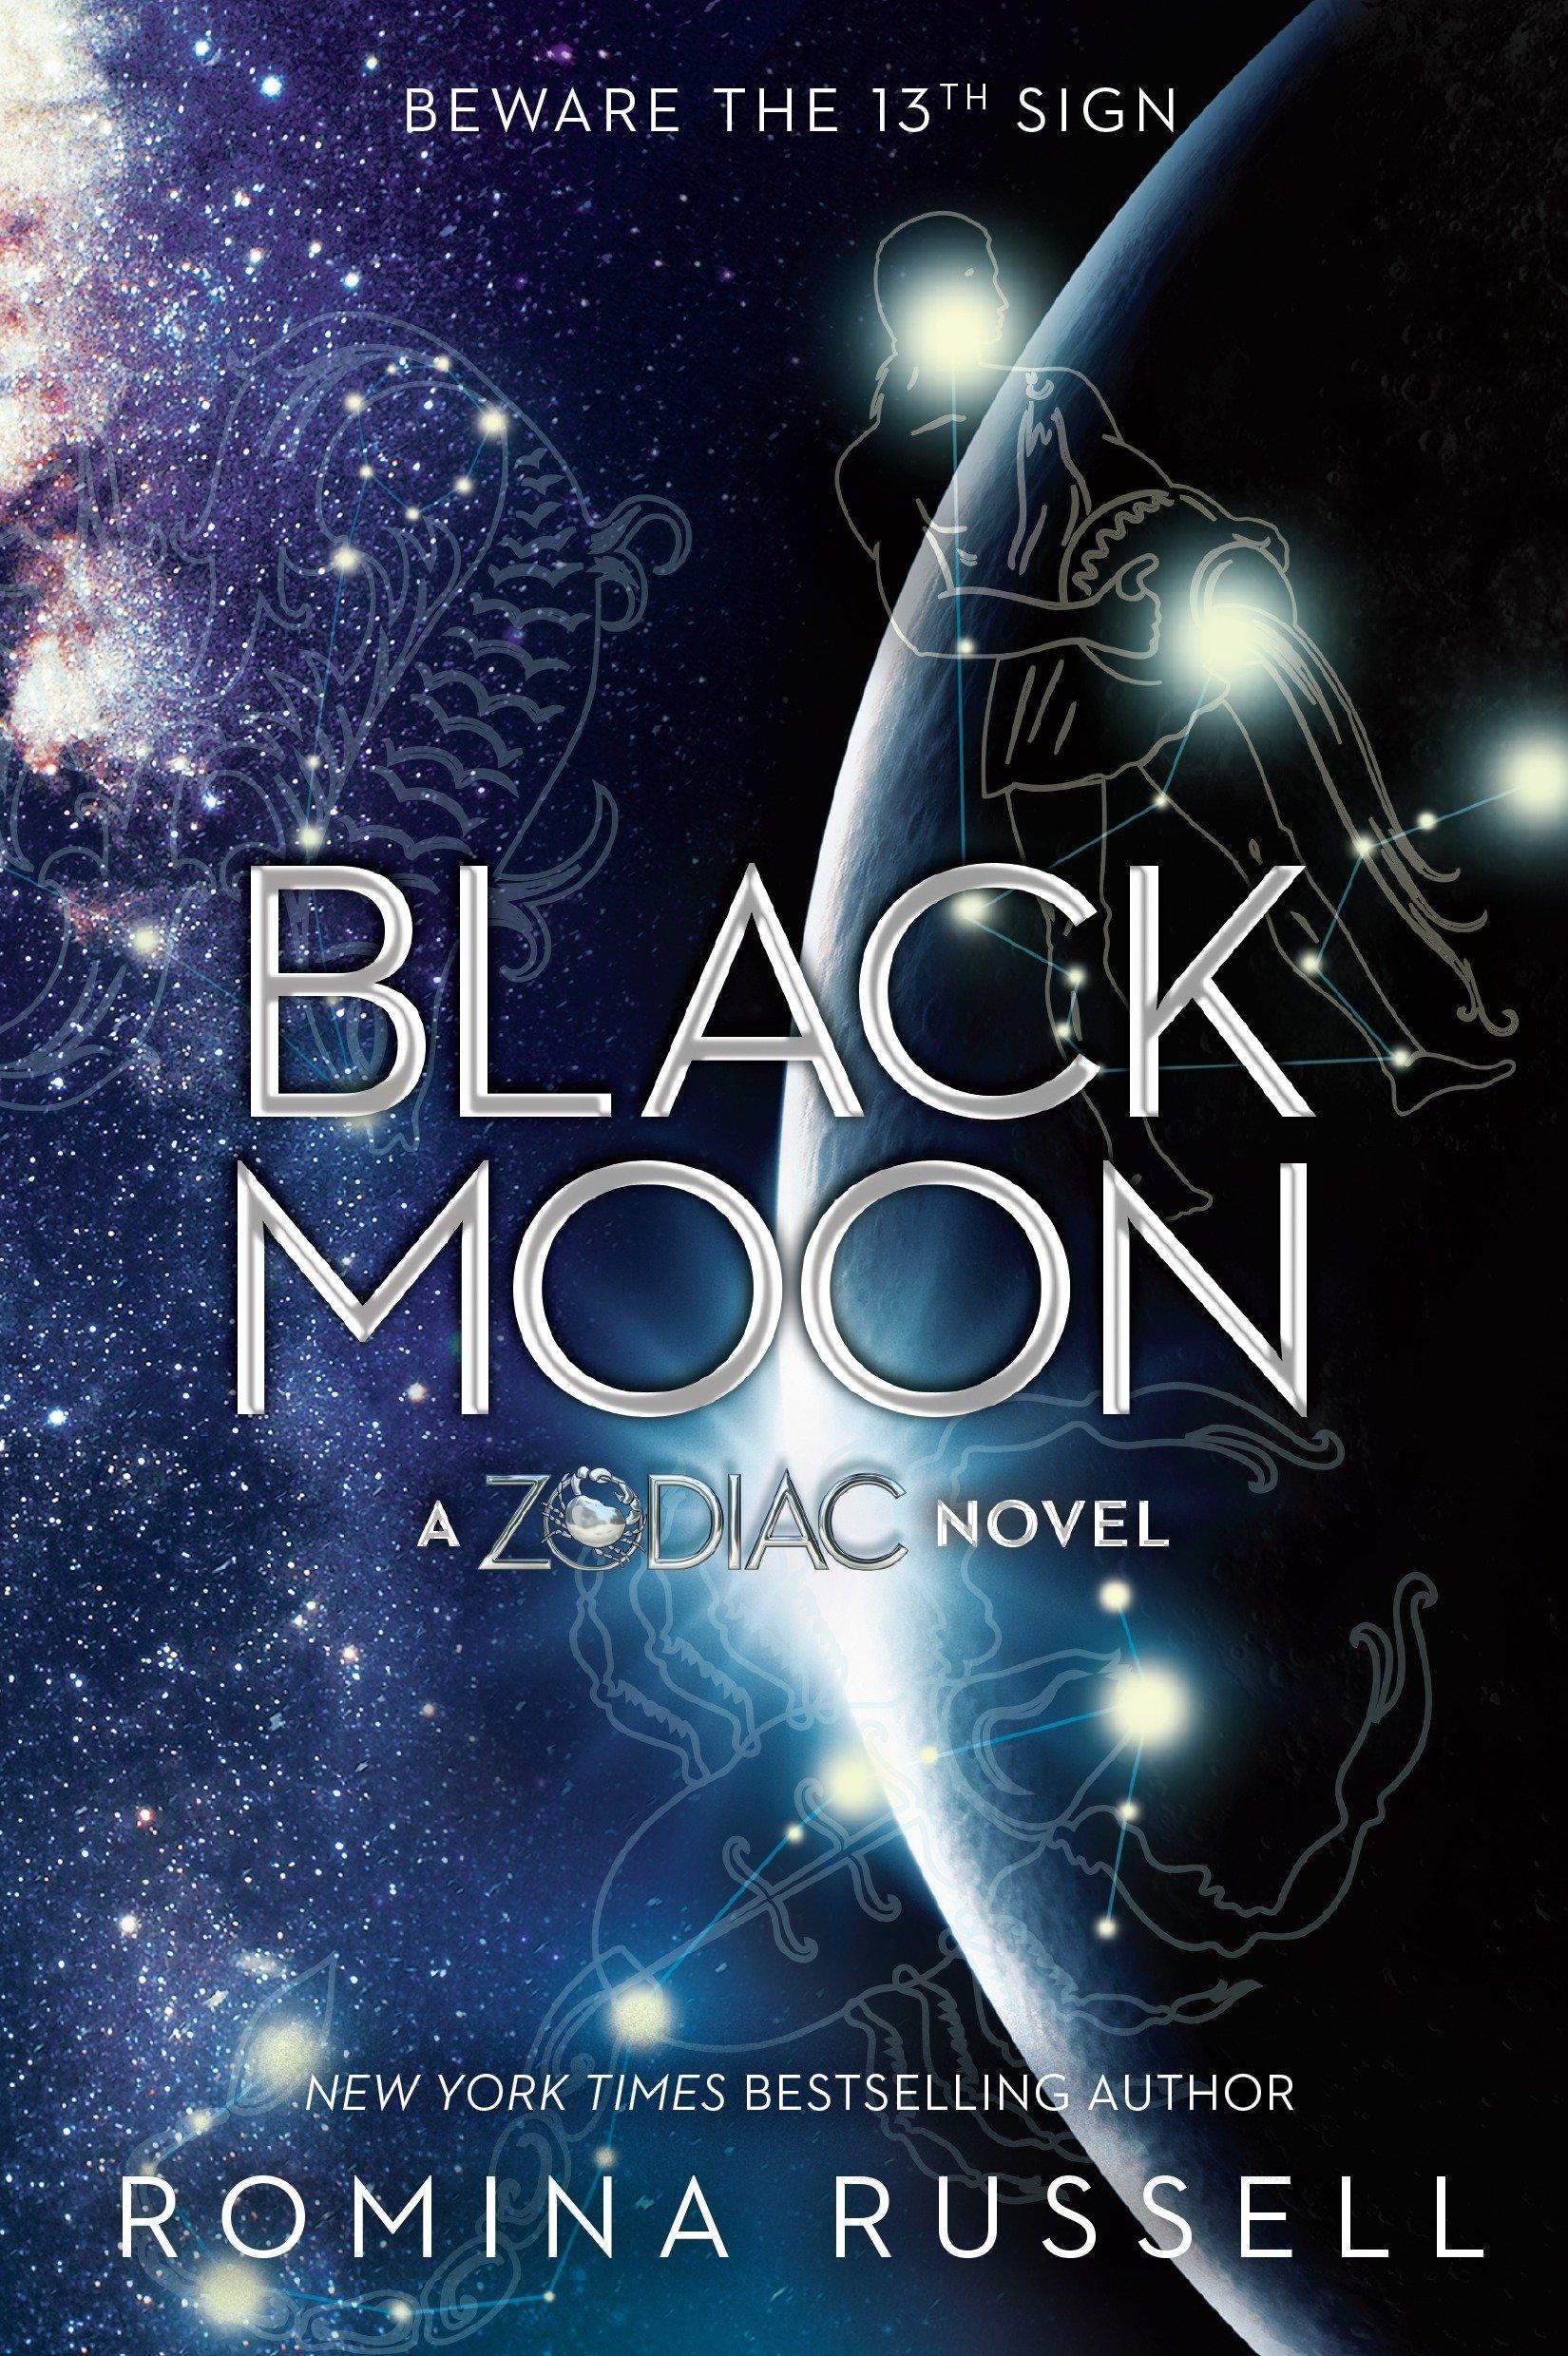 Amazon.com: Black Moon (Zodiac) (9781595147462): Russell, Romina: Books